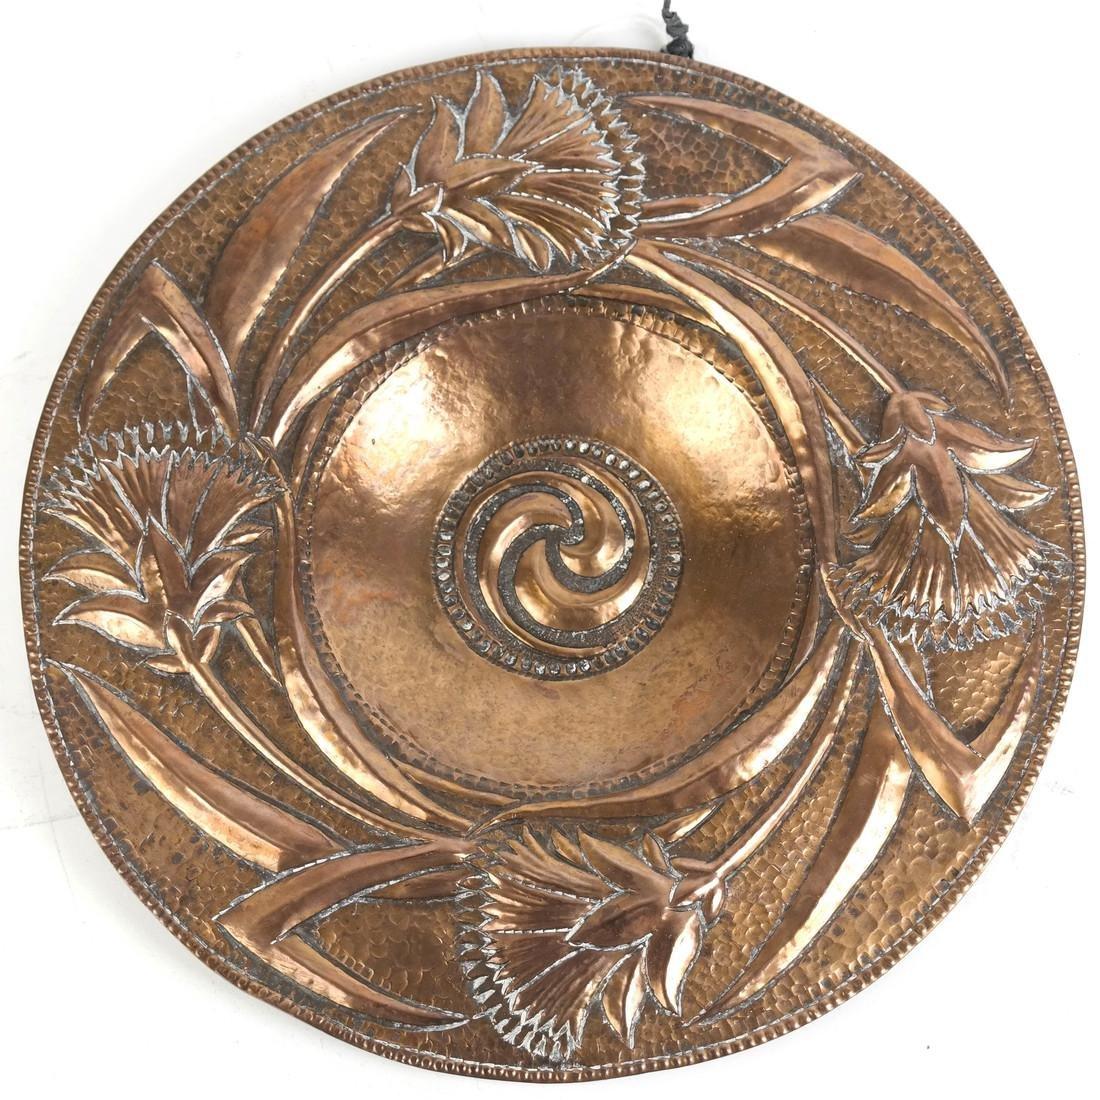 Art Nouveau Copper Plate by John Pearson